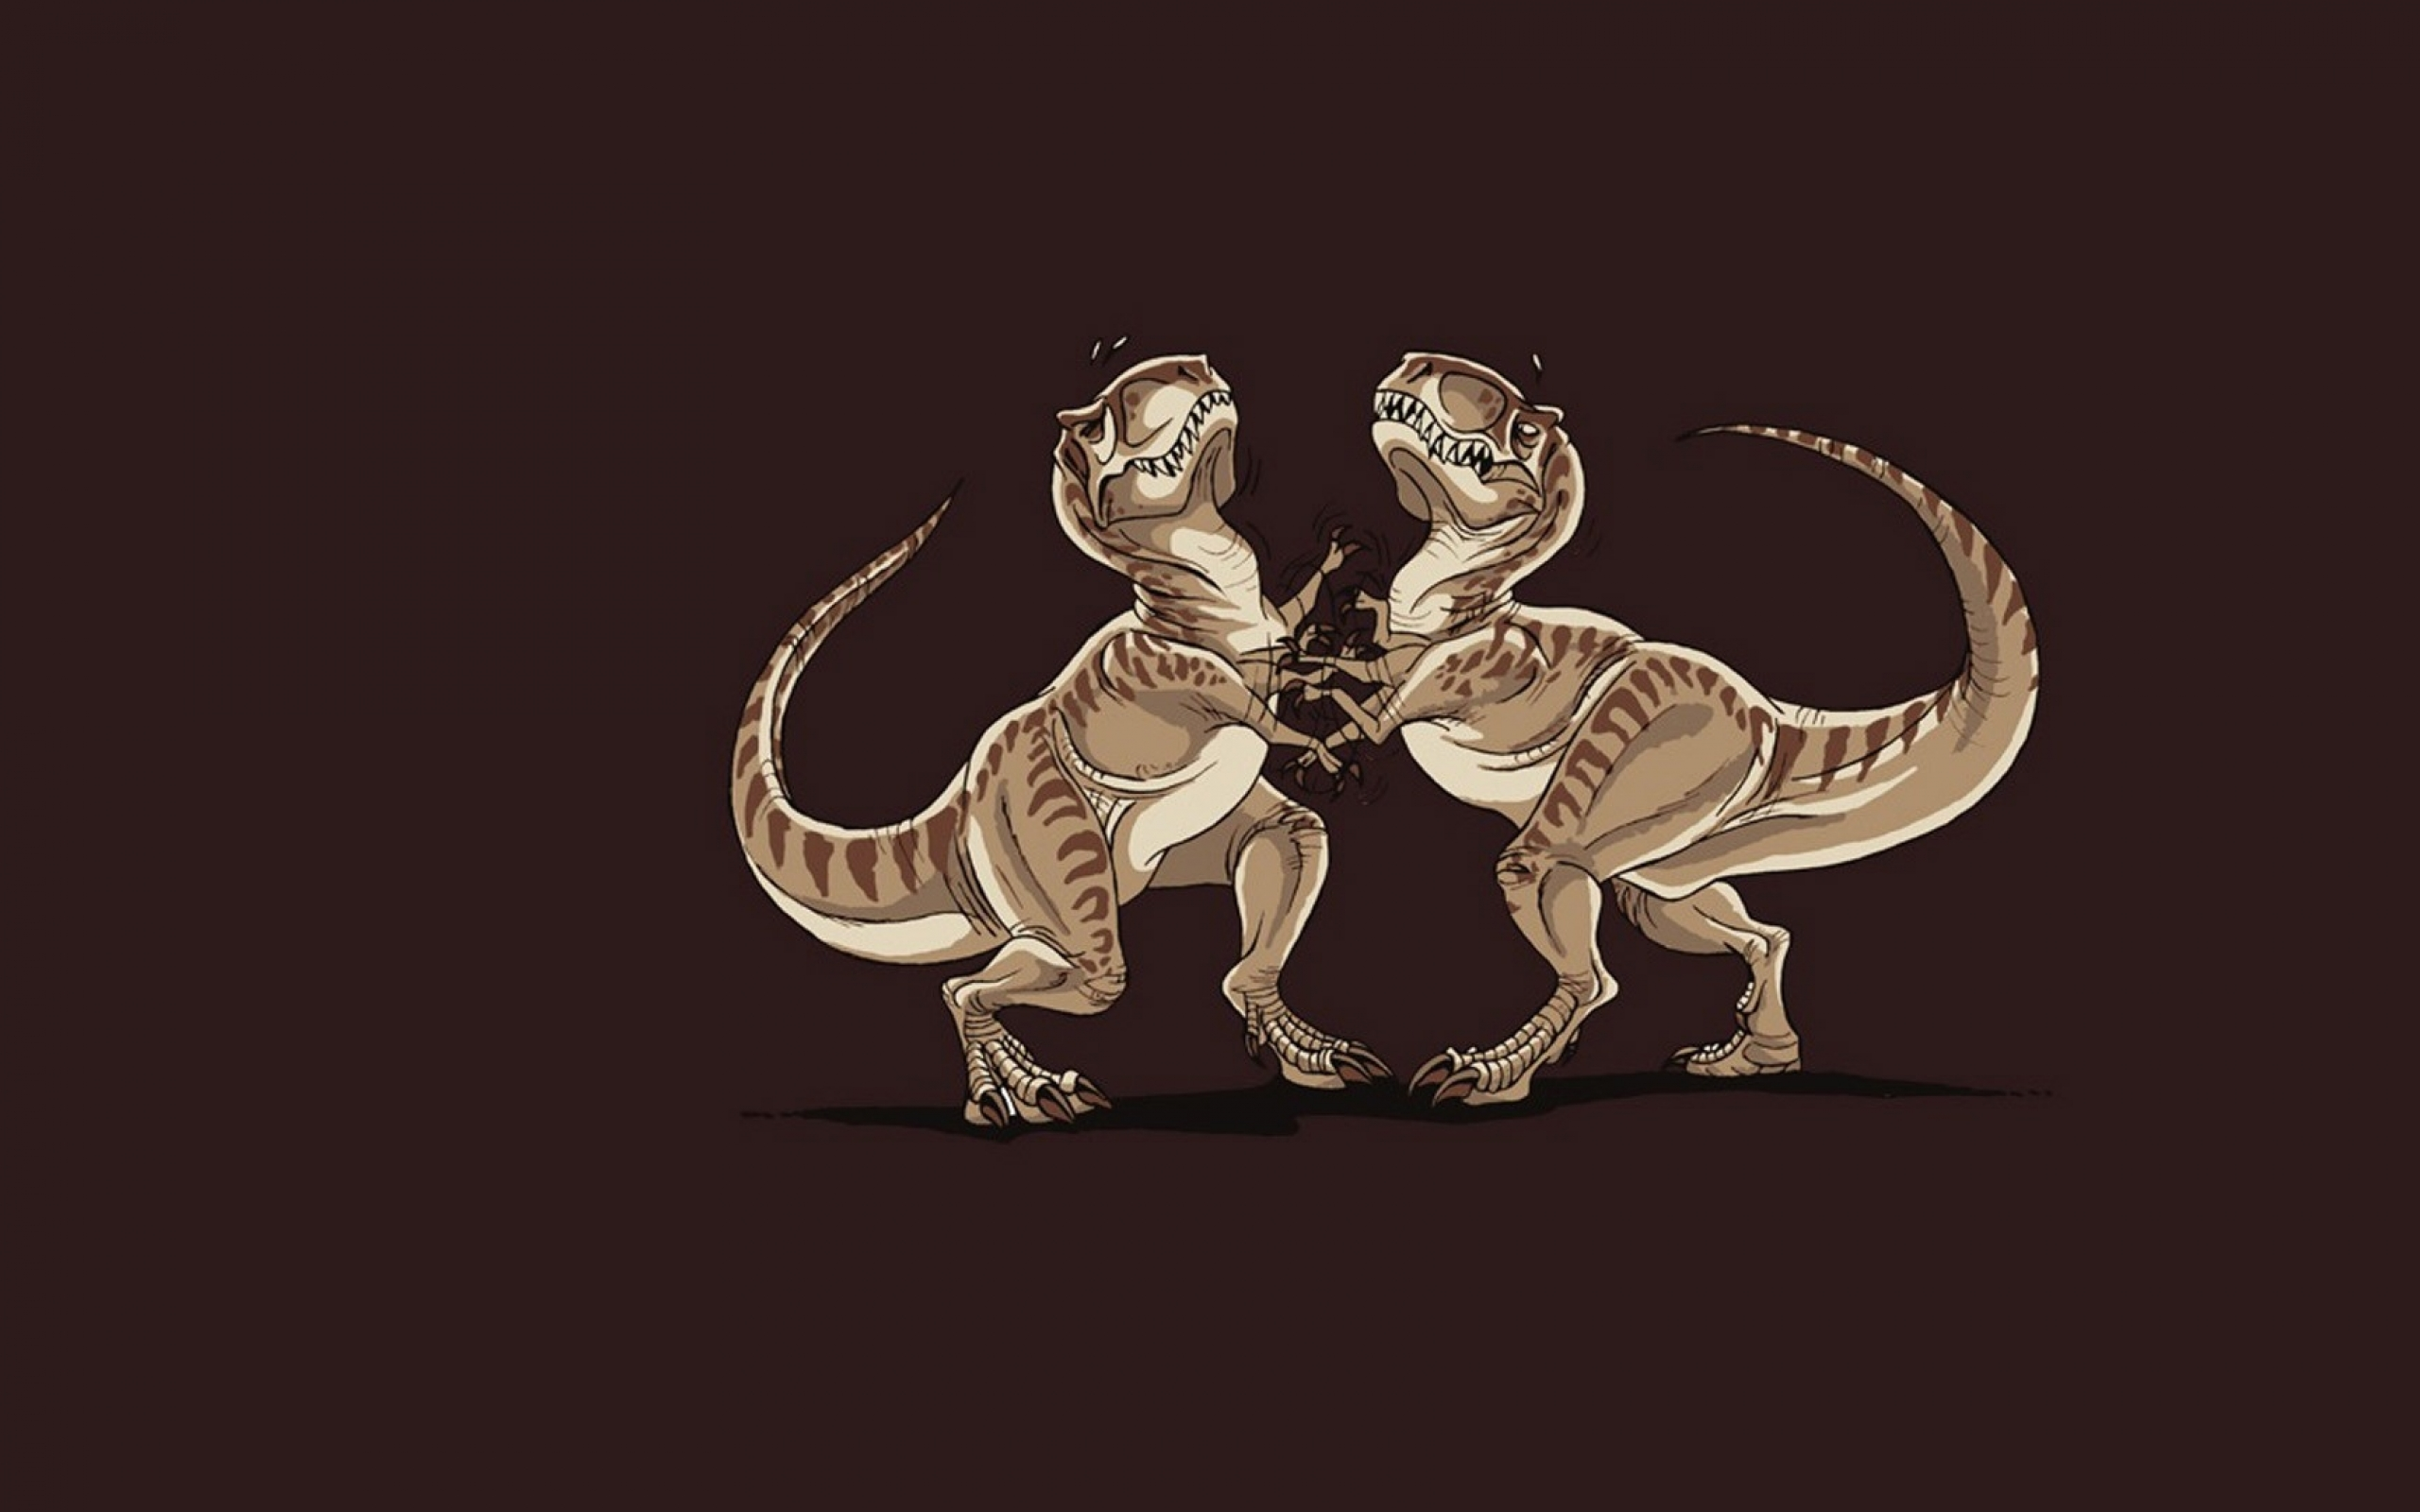 dinosaur phone wallpaper - photo #38